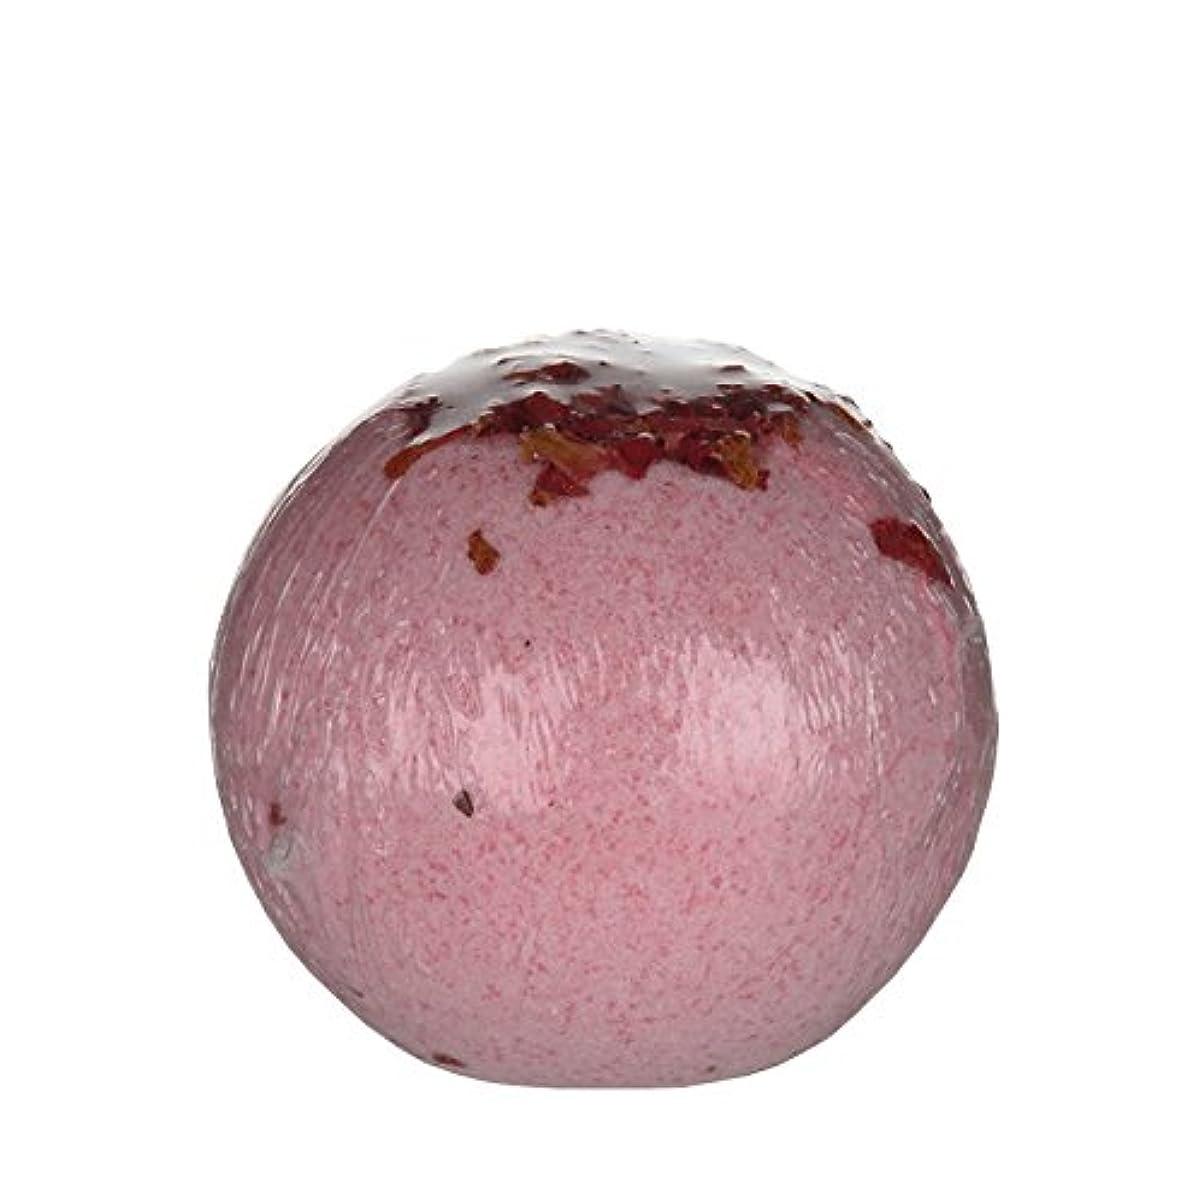 Treets Bath Ball Lavender Love 170g (Pack of 6) - Treetsバスボールラベンダーの愛の170グラム (x6) [並行輸入品]